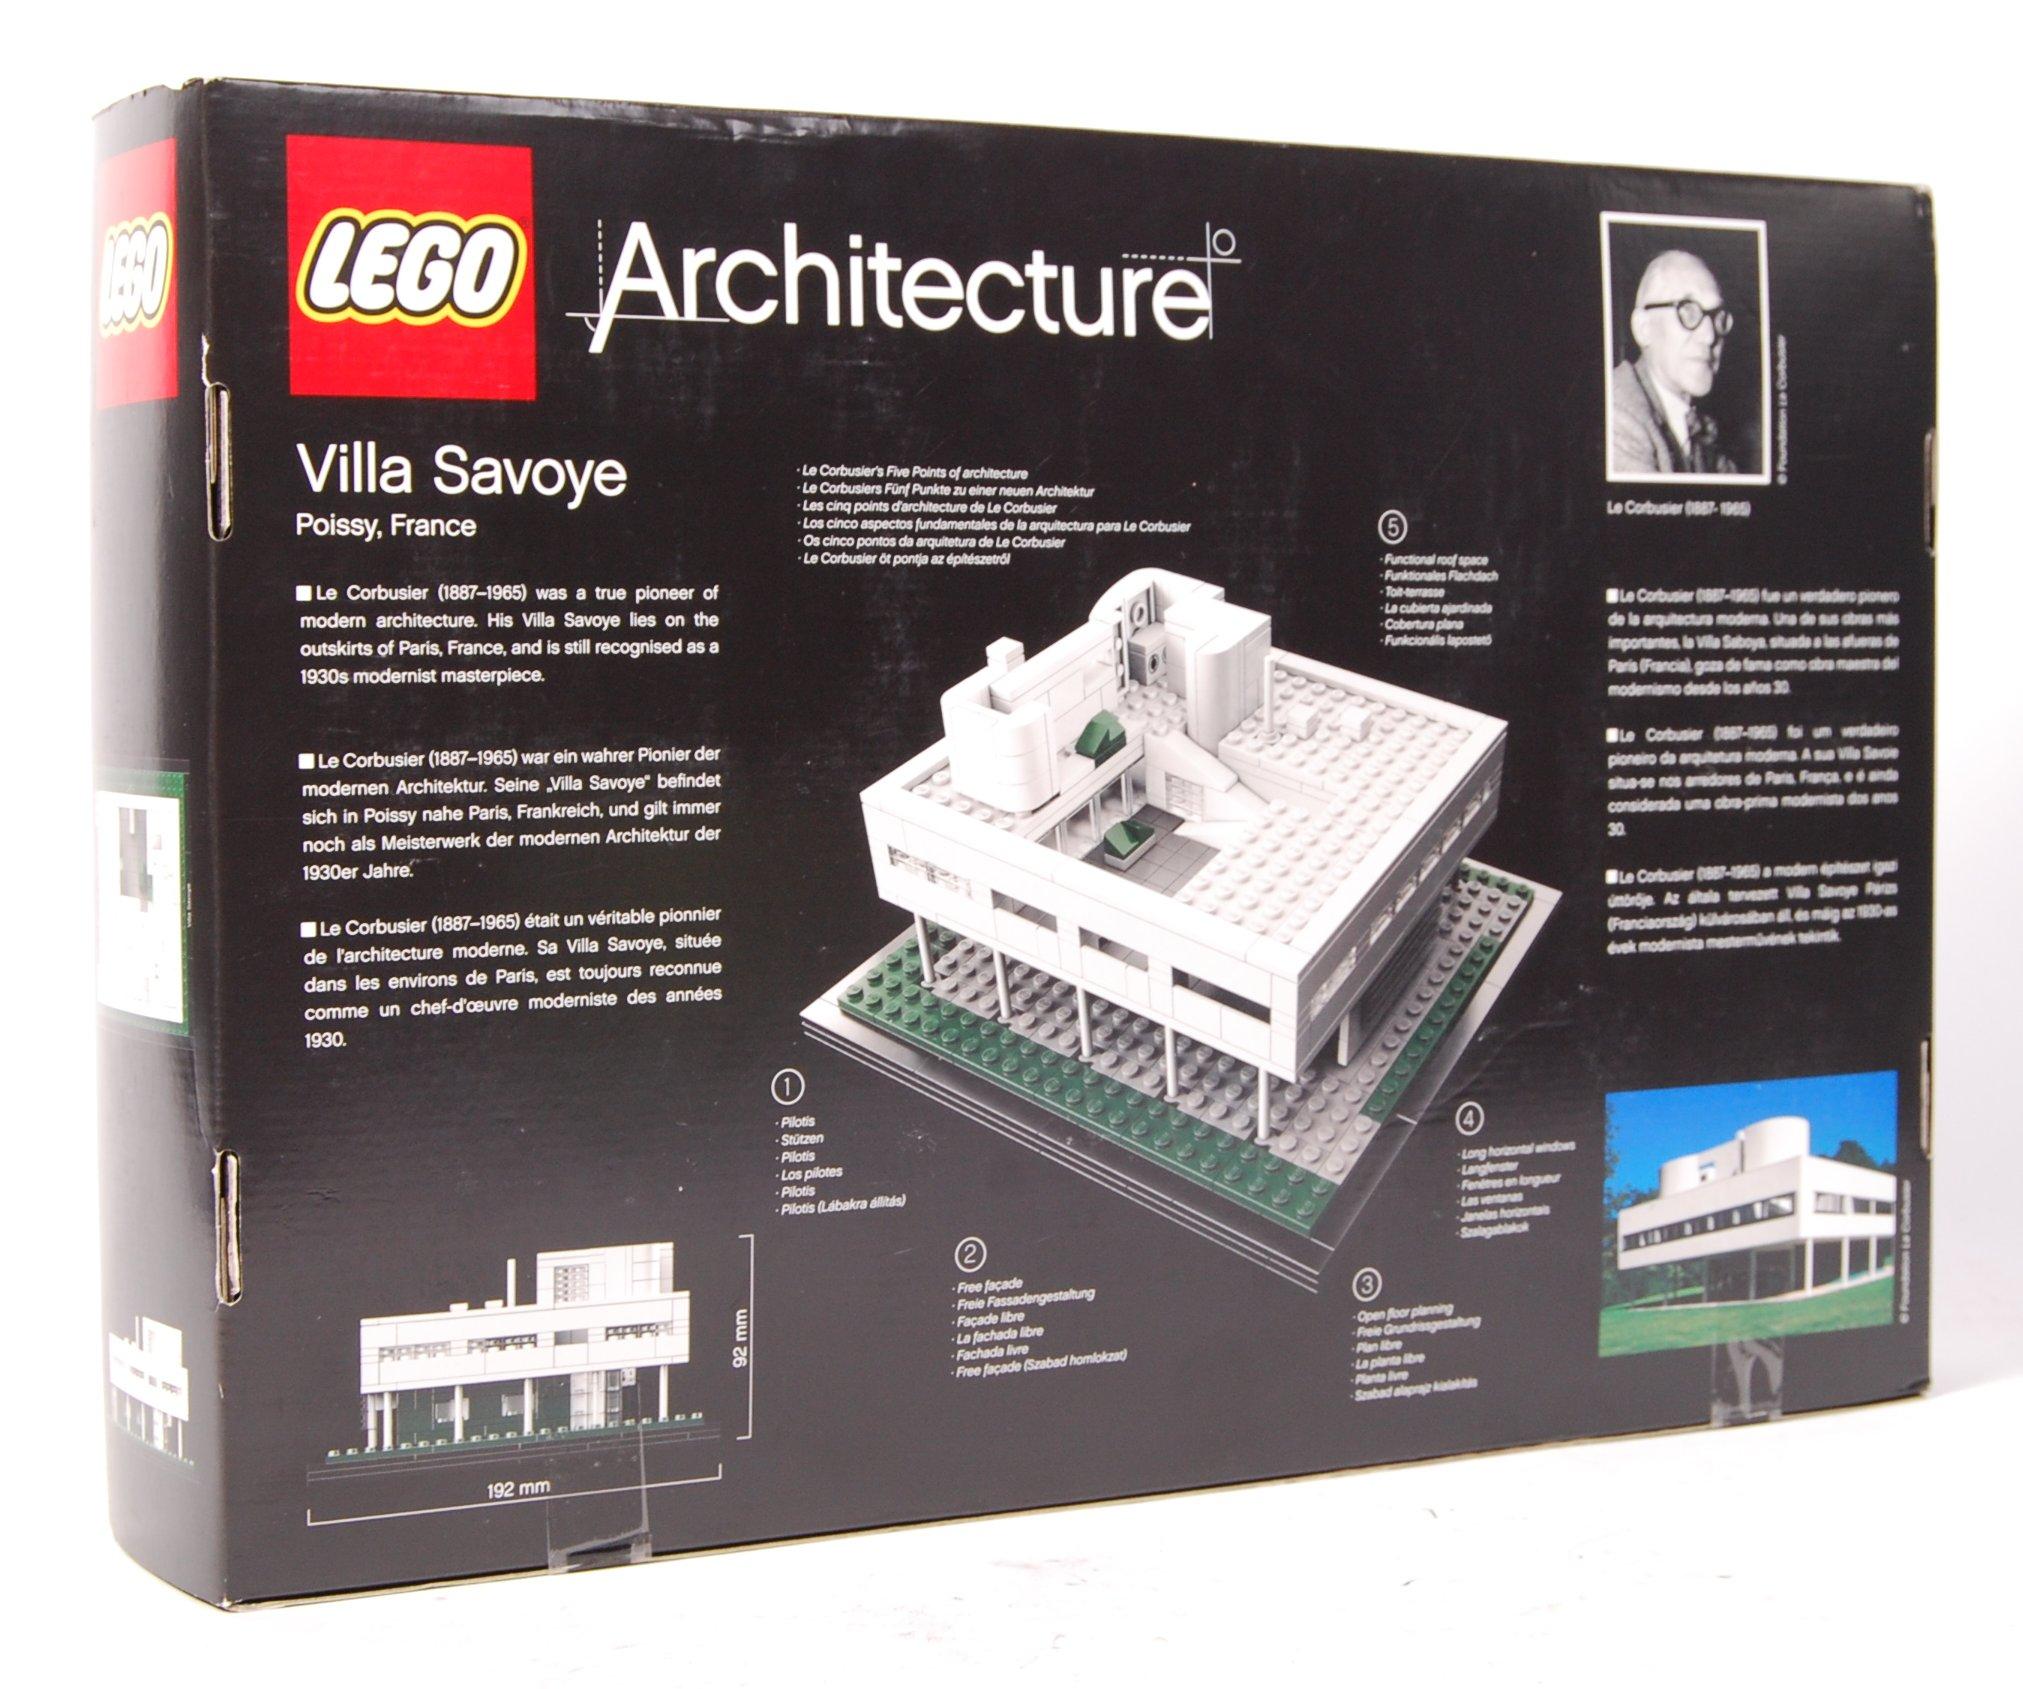 LEGO ARCHITECTURE SET NO. 21014 ' VILLA SAVOYE ' B - Image 2 of 2